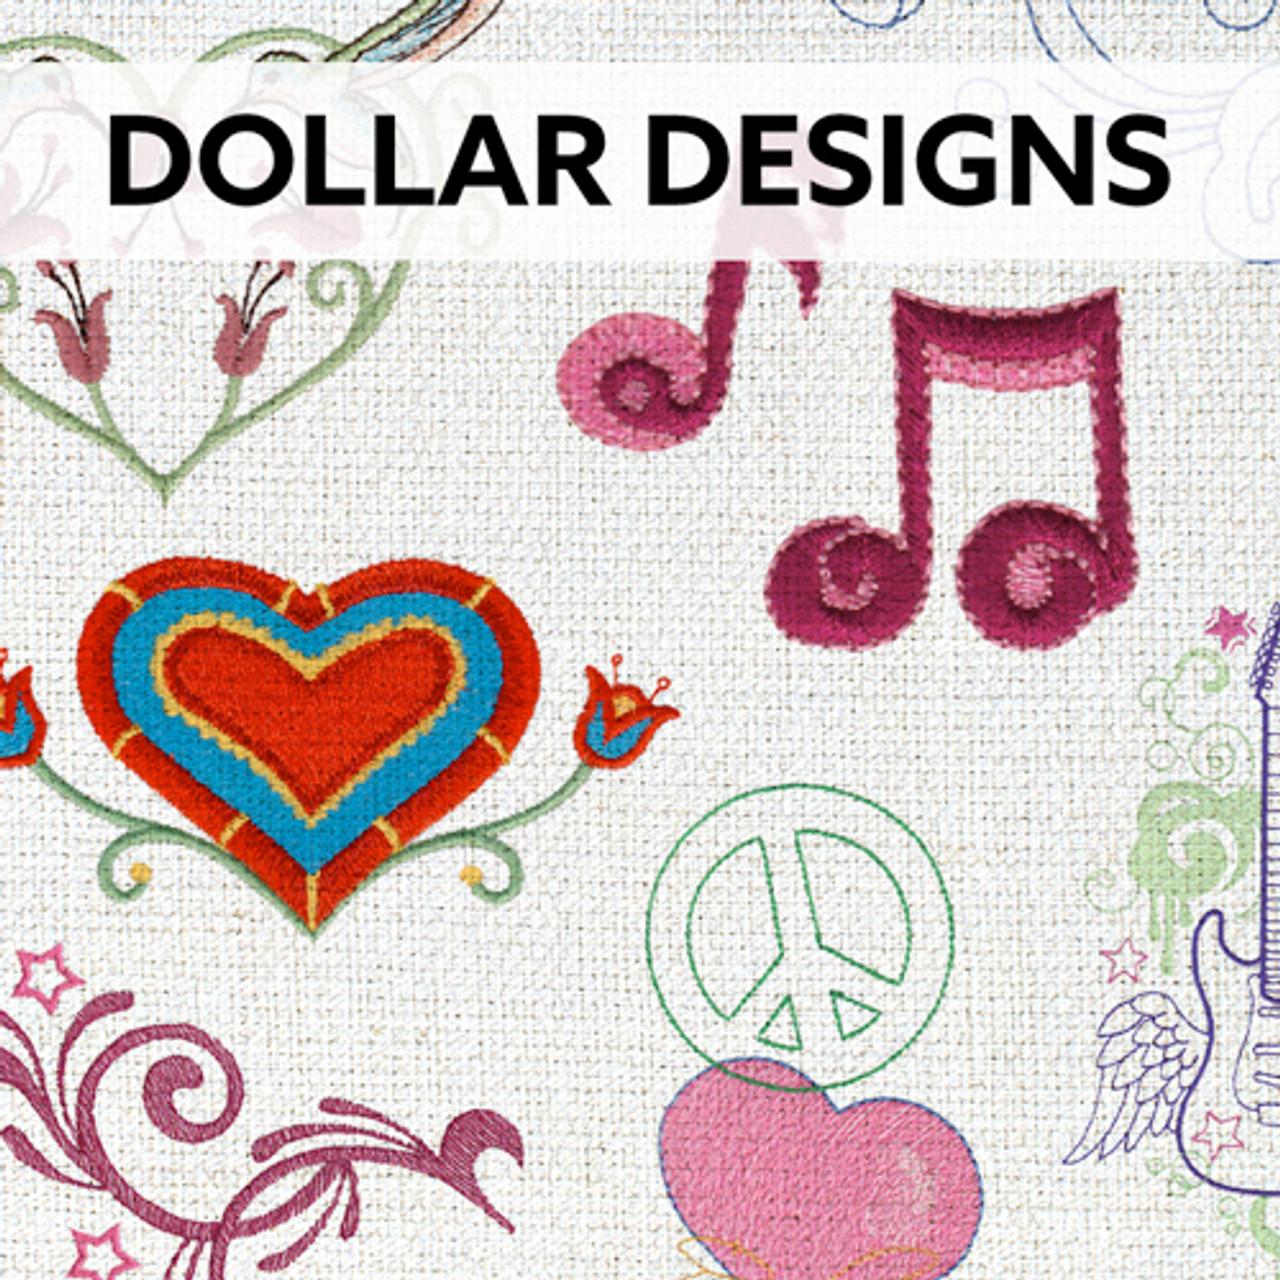 Dollar Designs